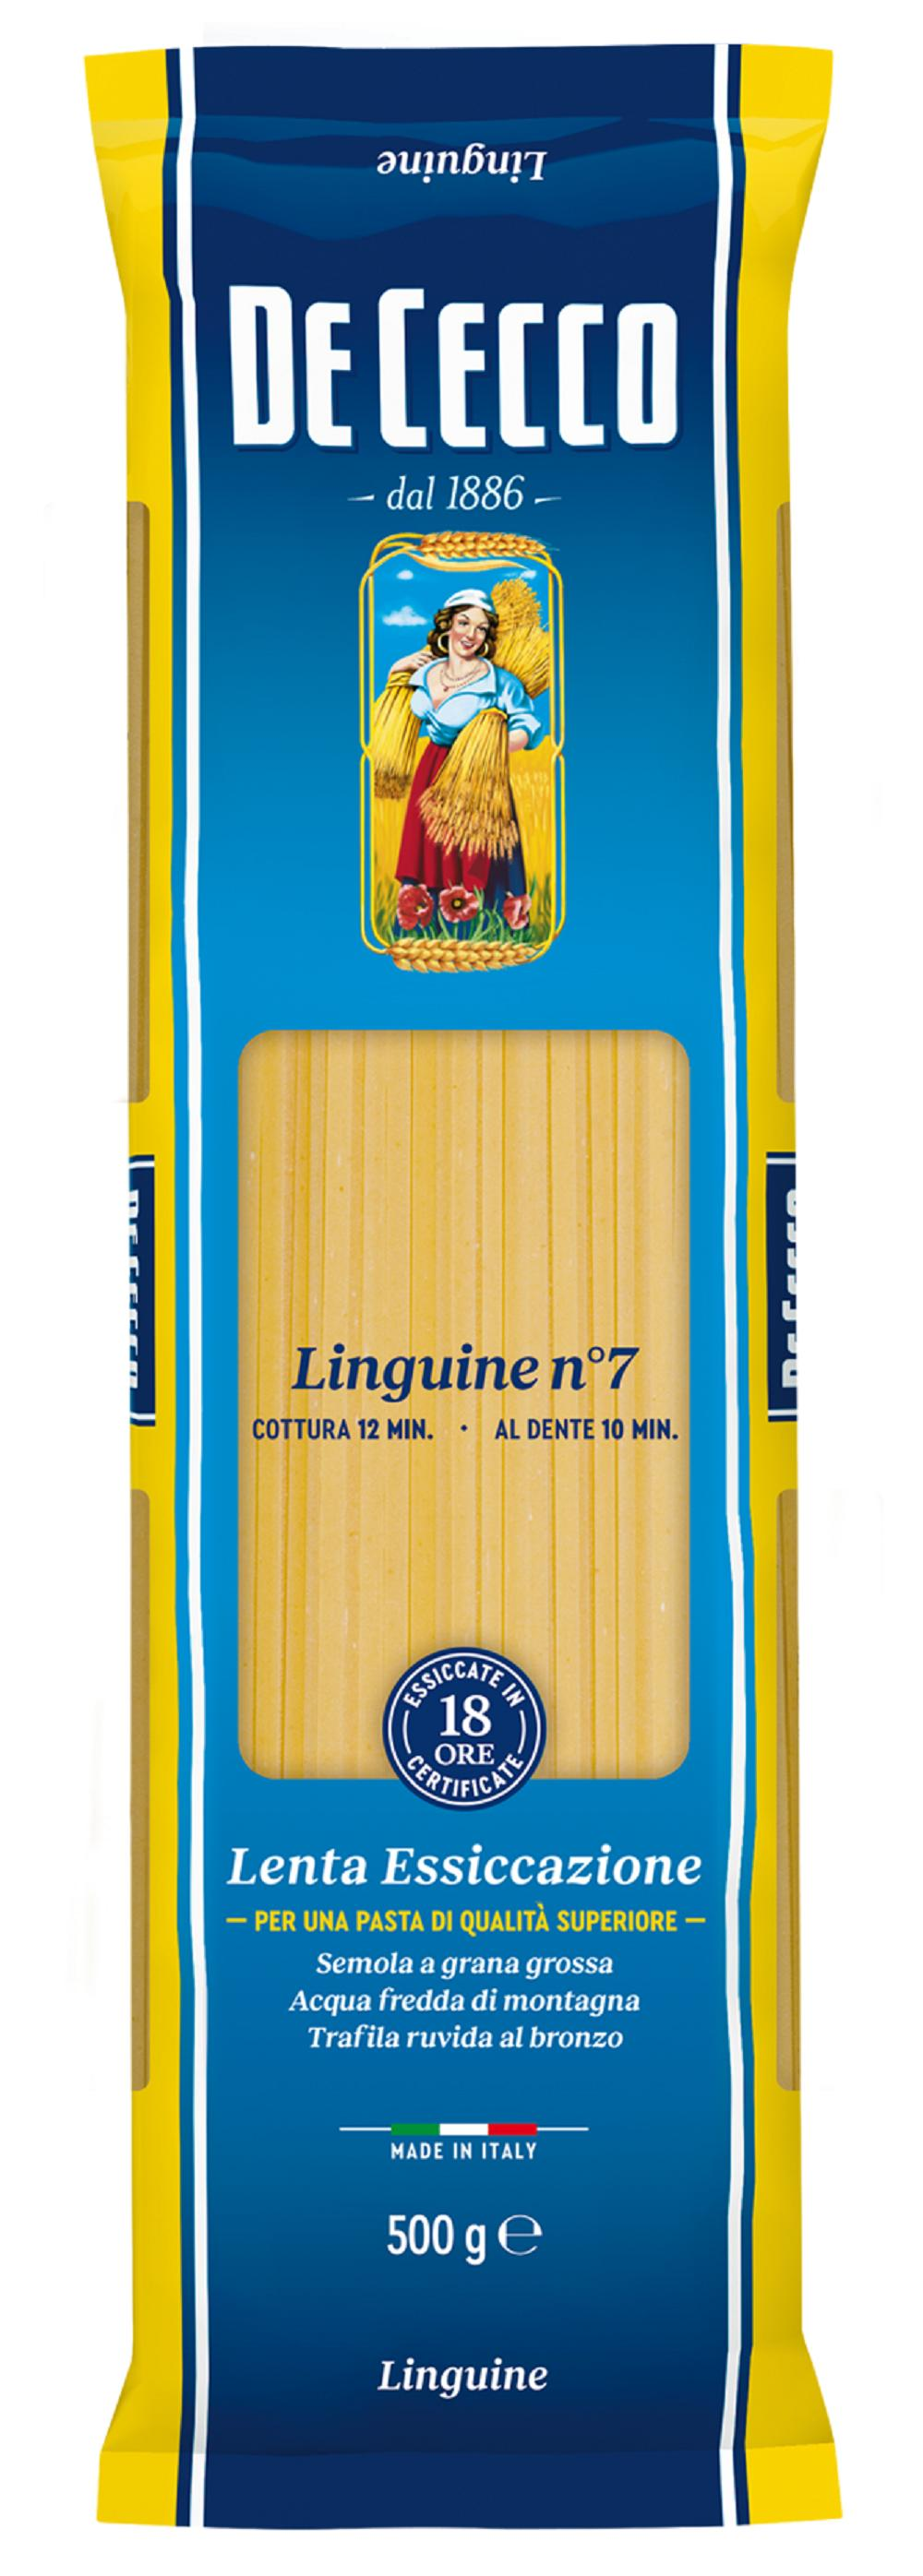 De Cecco Linguine N°7